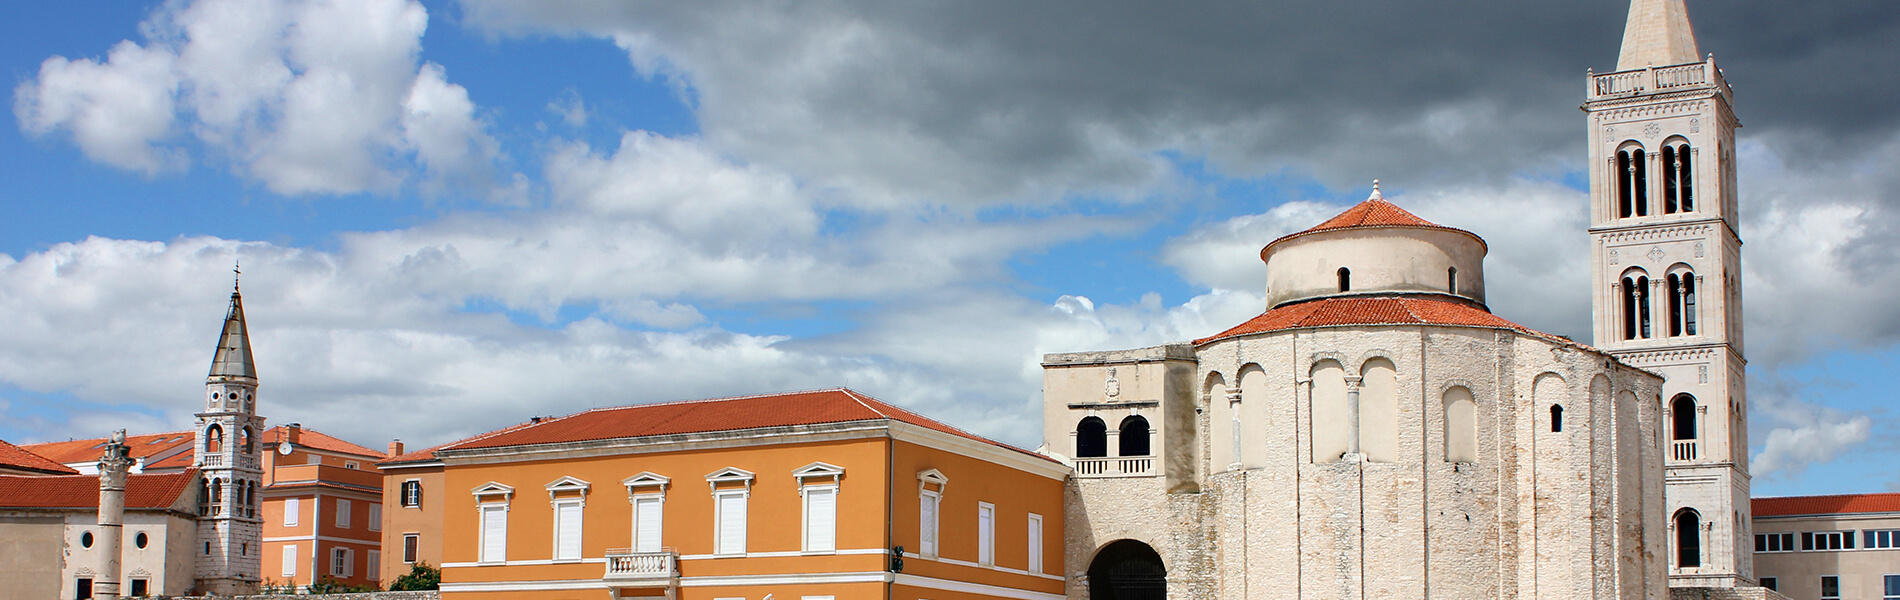 Destination - Zadar